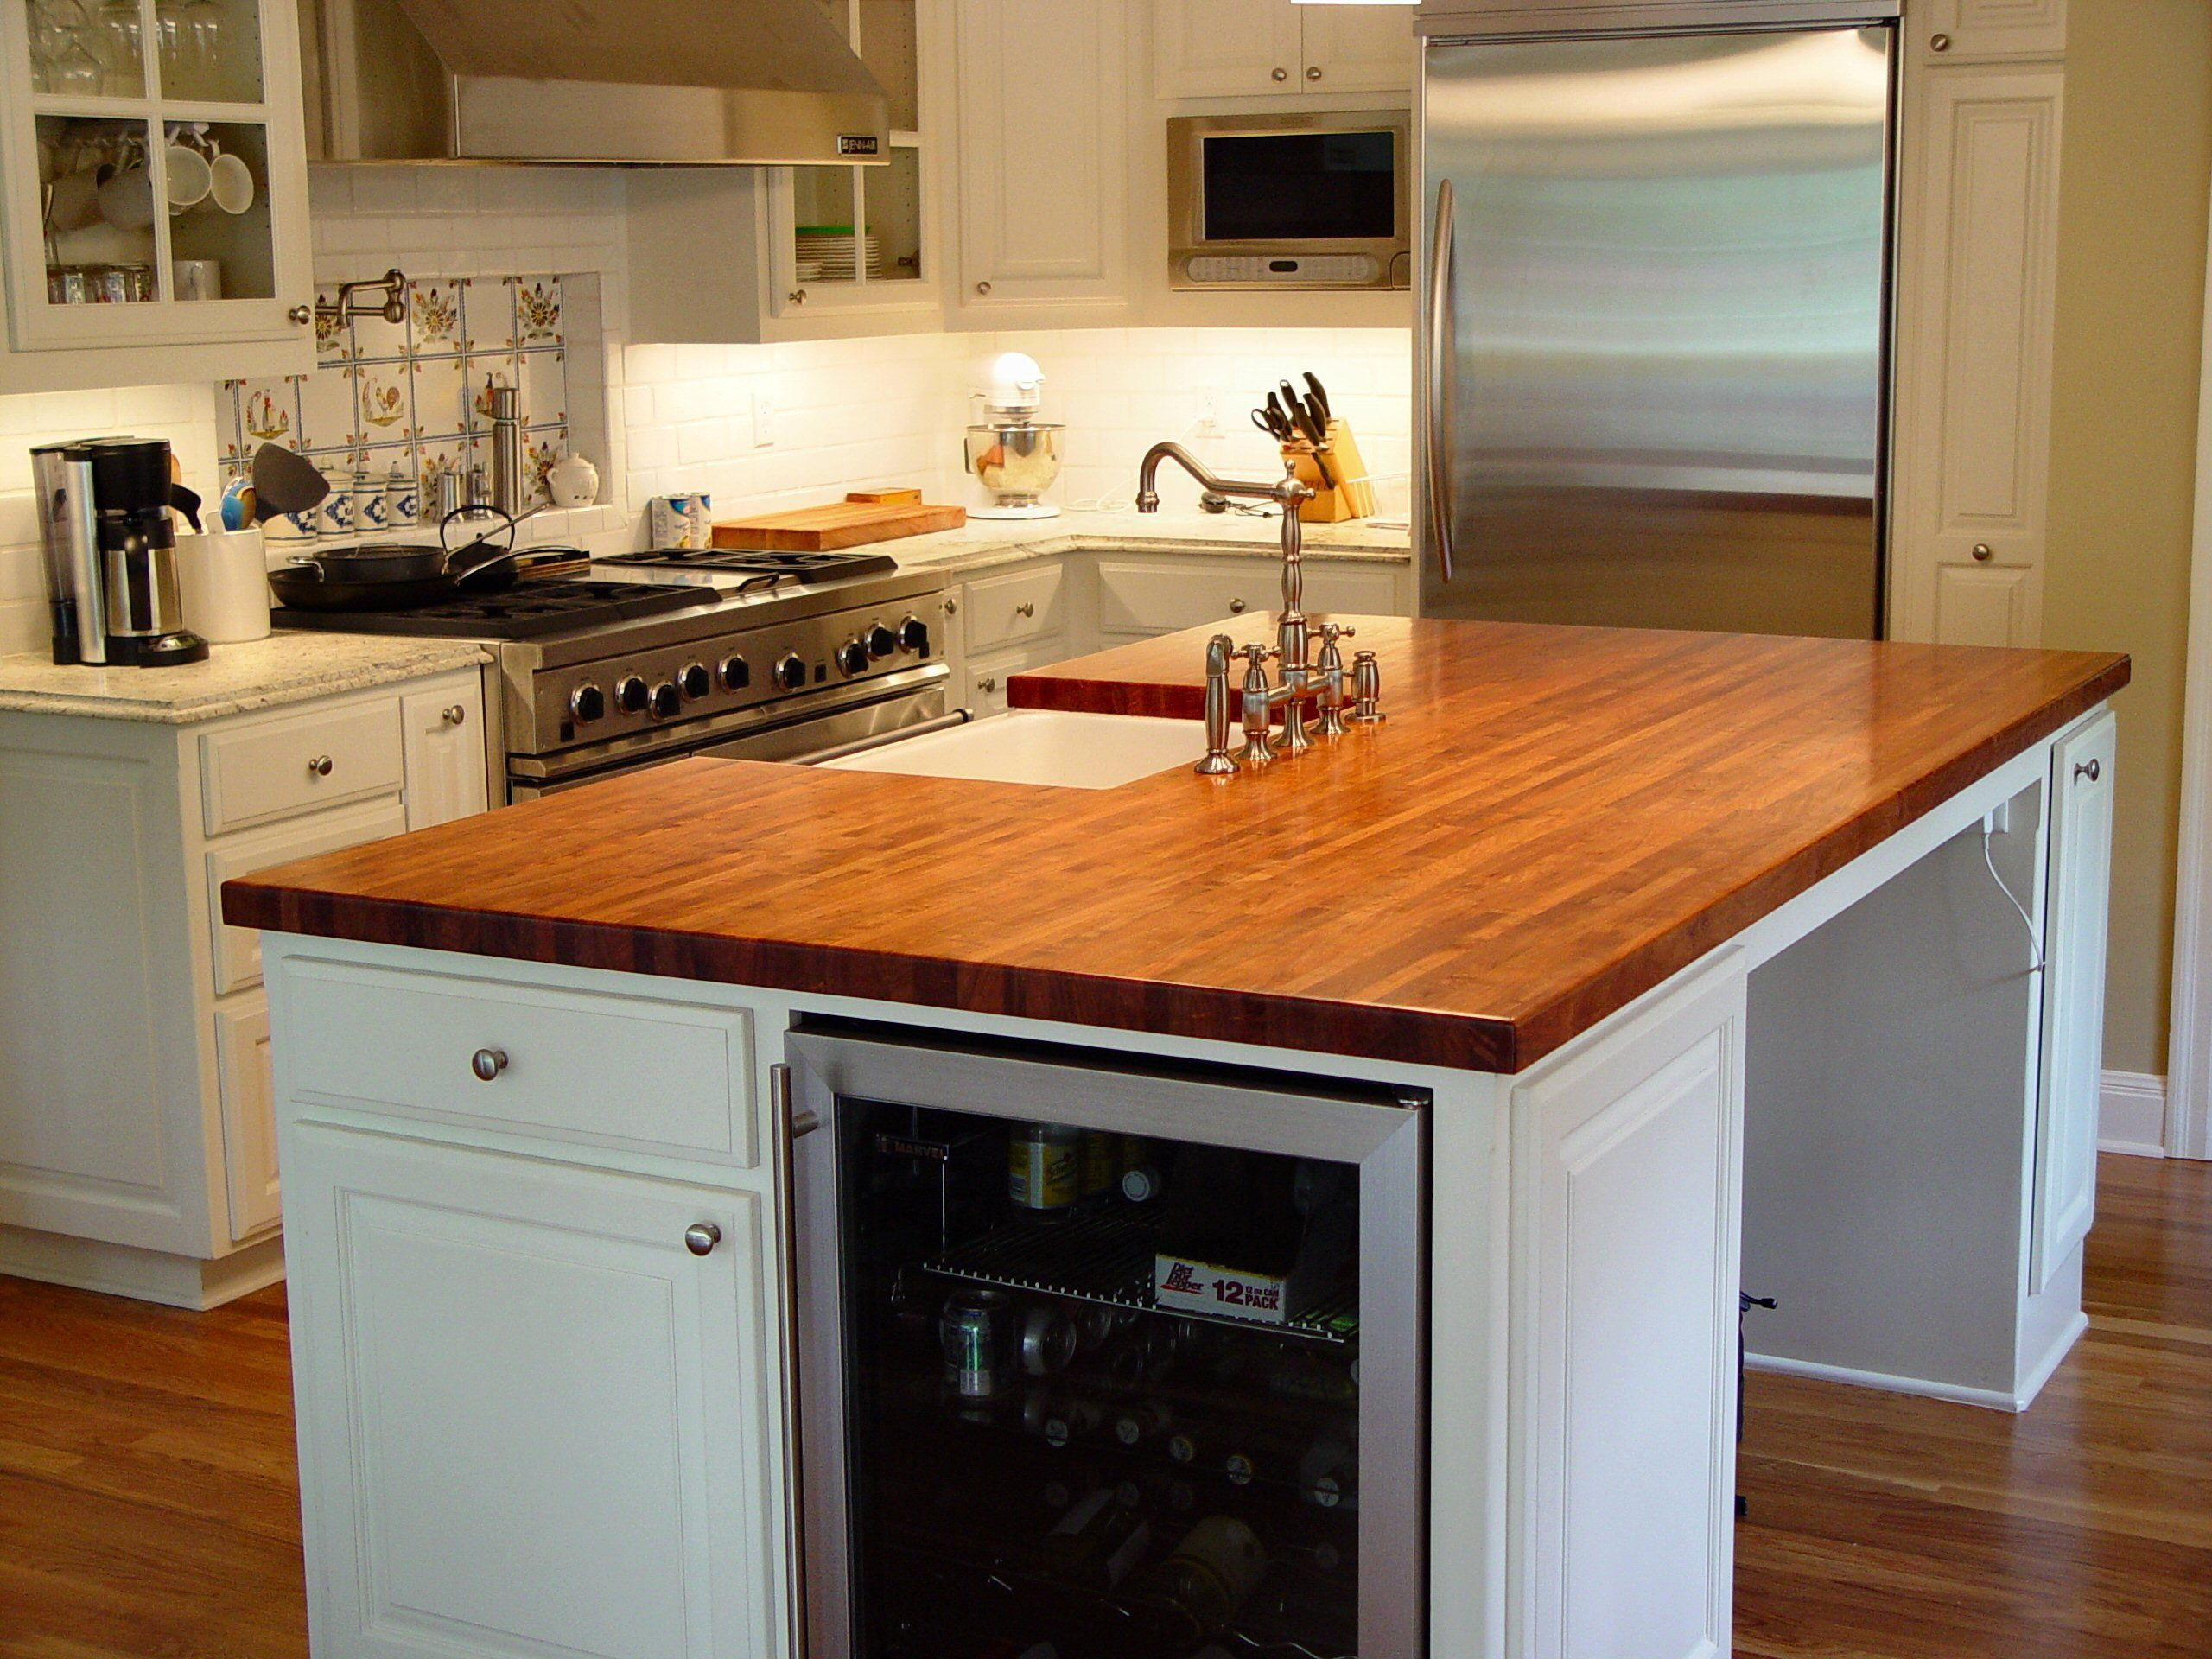 Mesquite Wood Countertop Photo Gallery By Devos Custom Woodworking